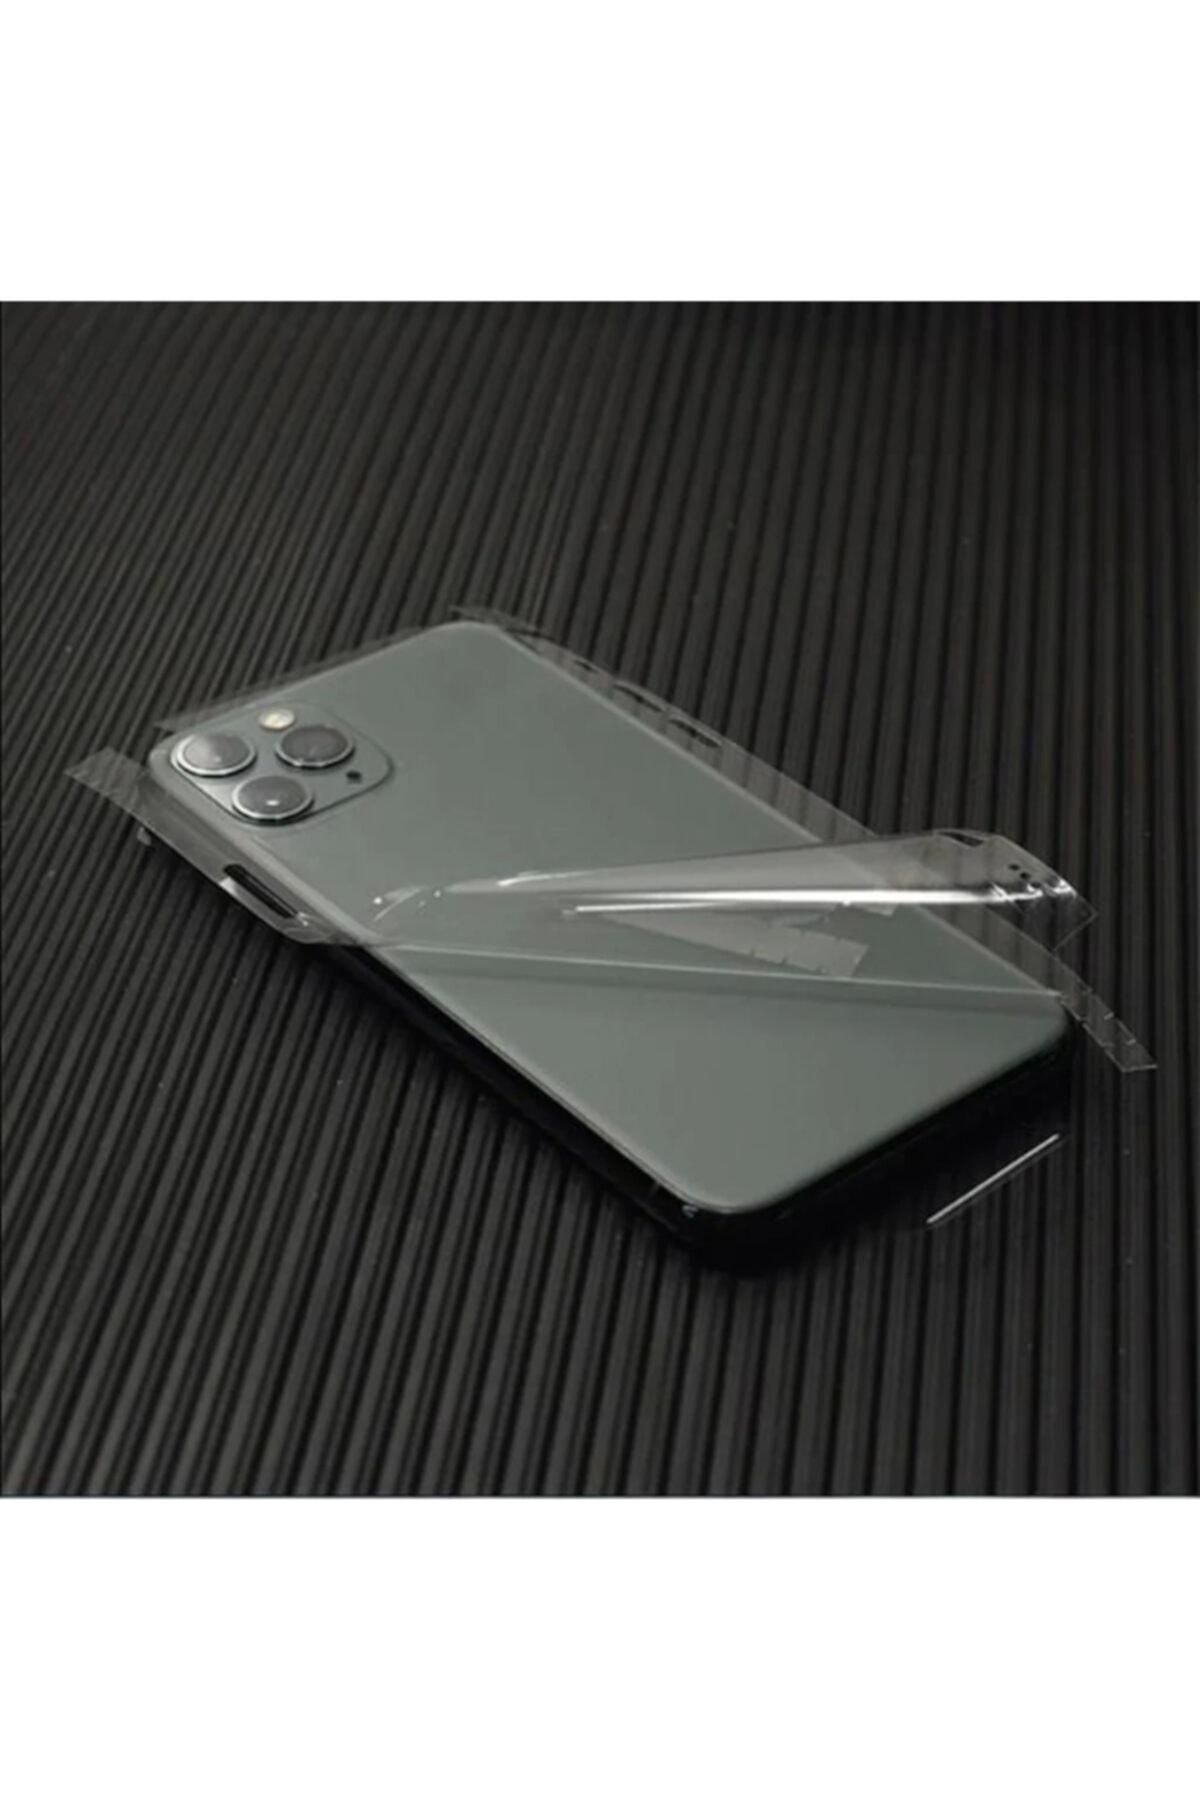 Iphone 12 Pro Max Uyumlu Arka Yan Kaplama Jelatin Sticker Kaplama Şeffaf